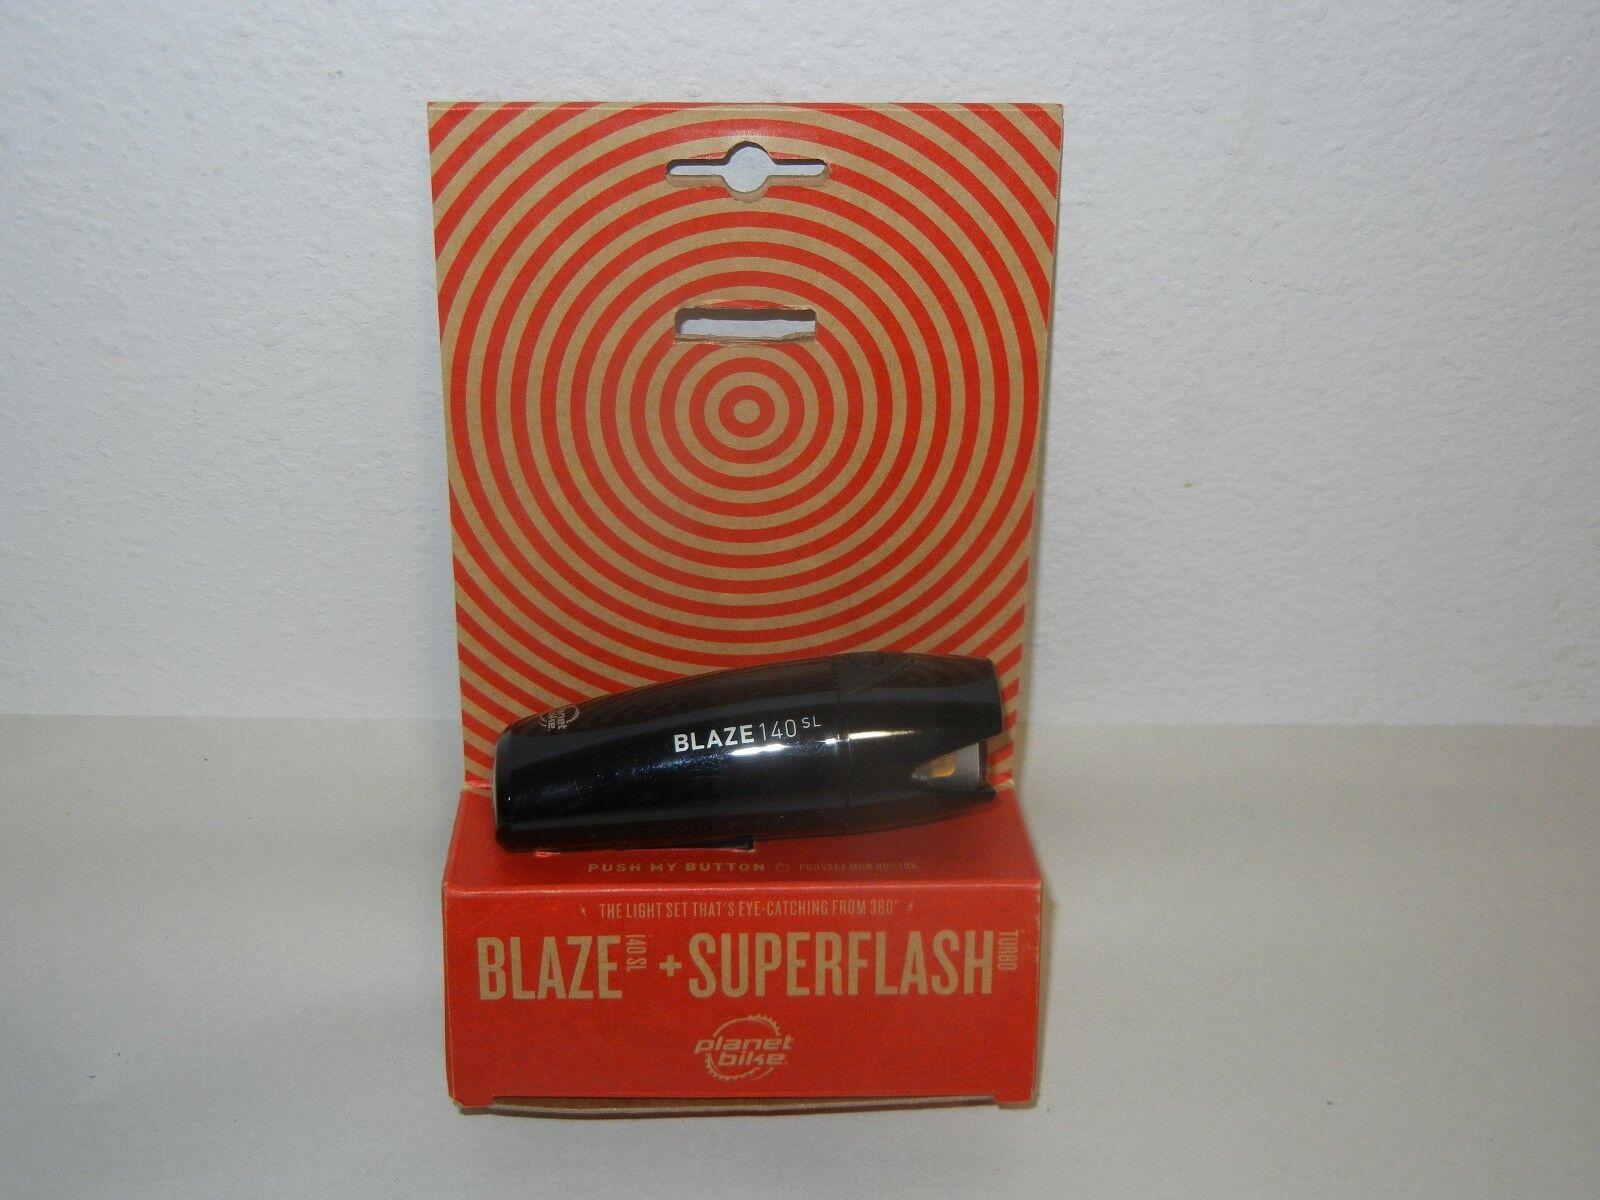 PLANET BIKE BLAZE 140 SL SUPERFLASH TURBO HEADLIGHT